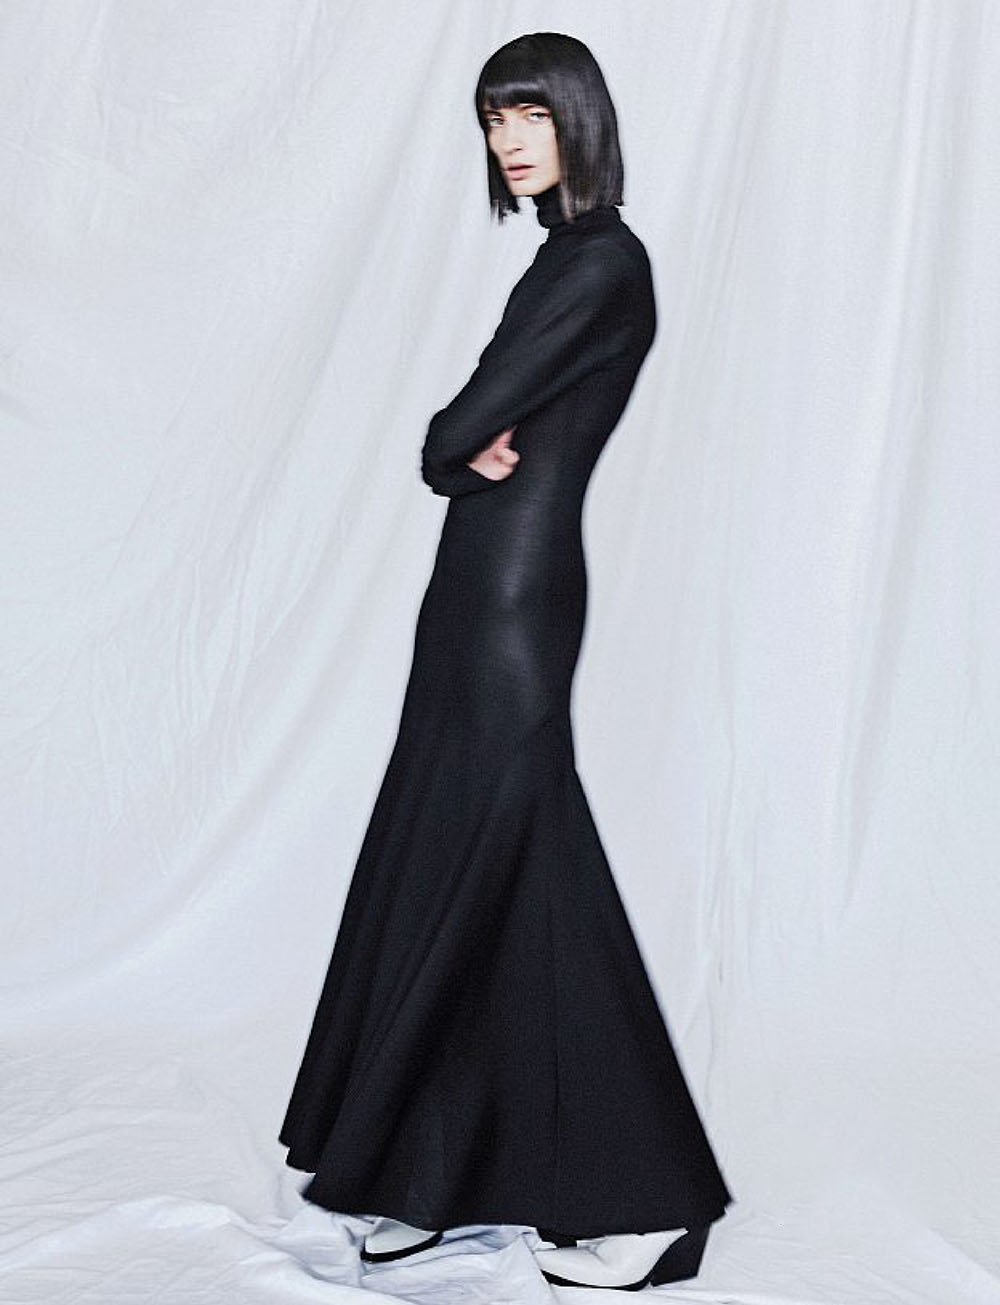 Mara Nica by Jacopo Moschin for Amica Magazine November 2020